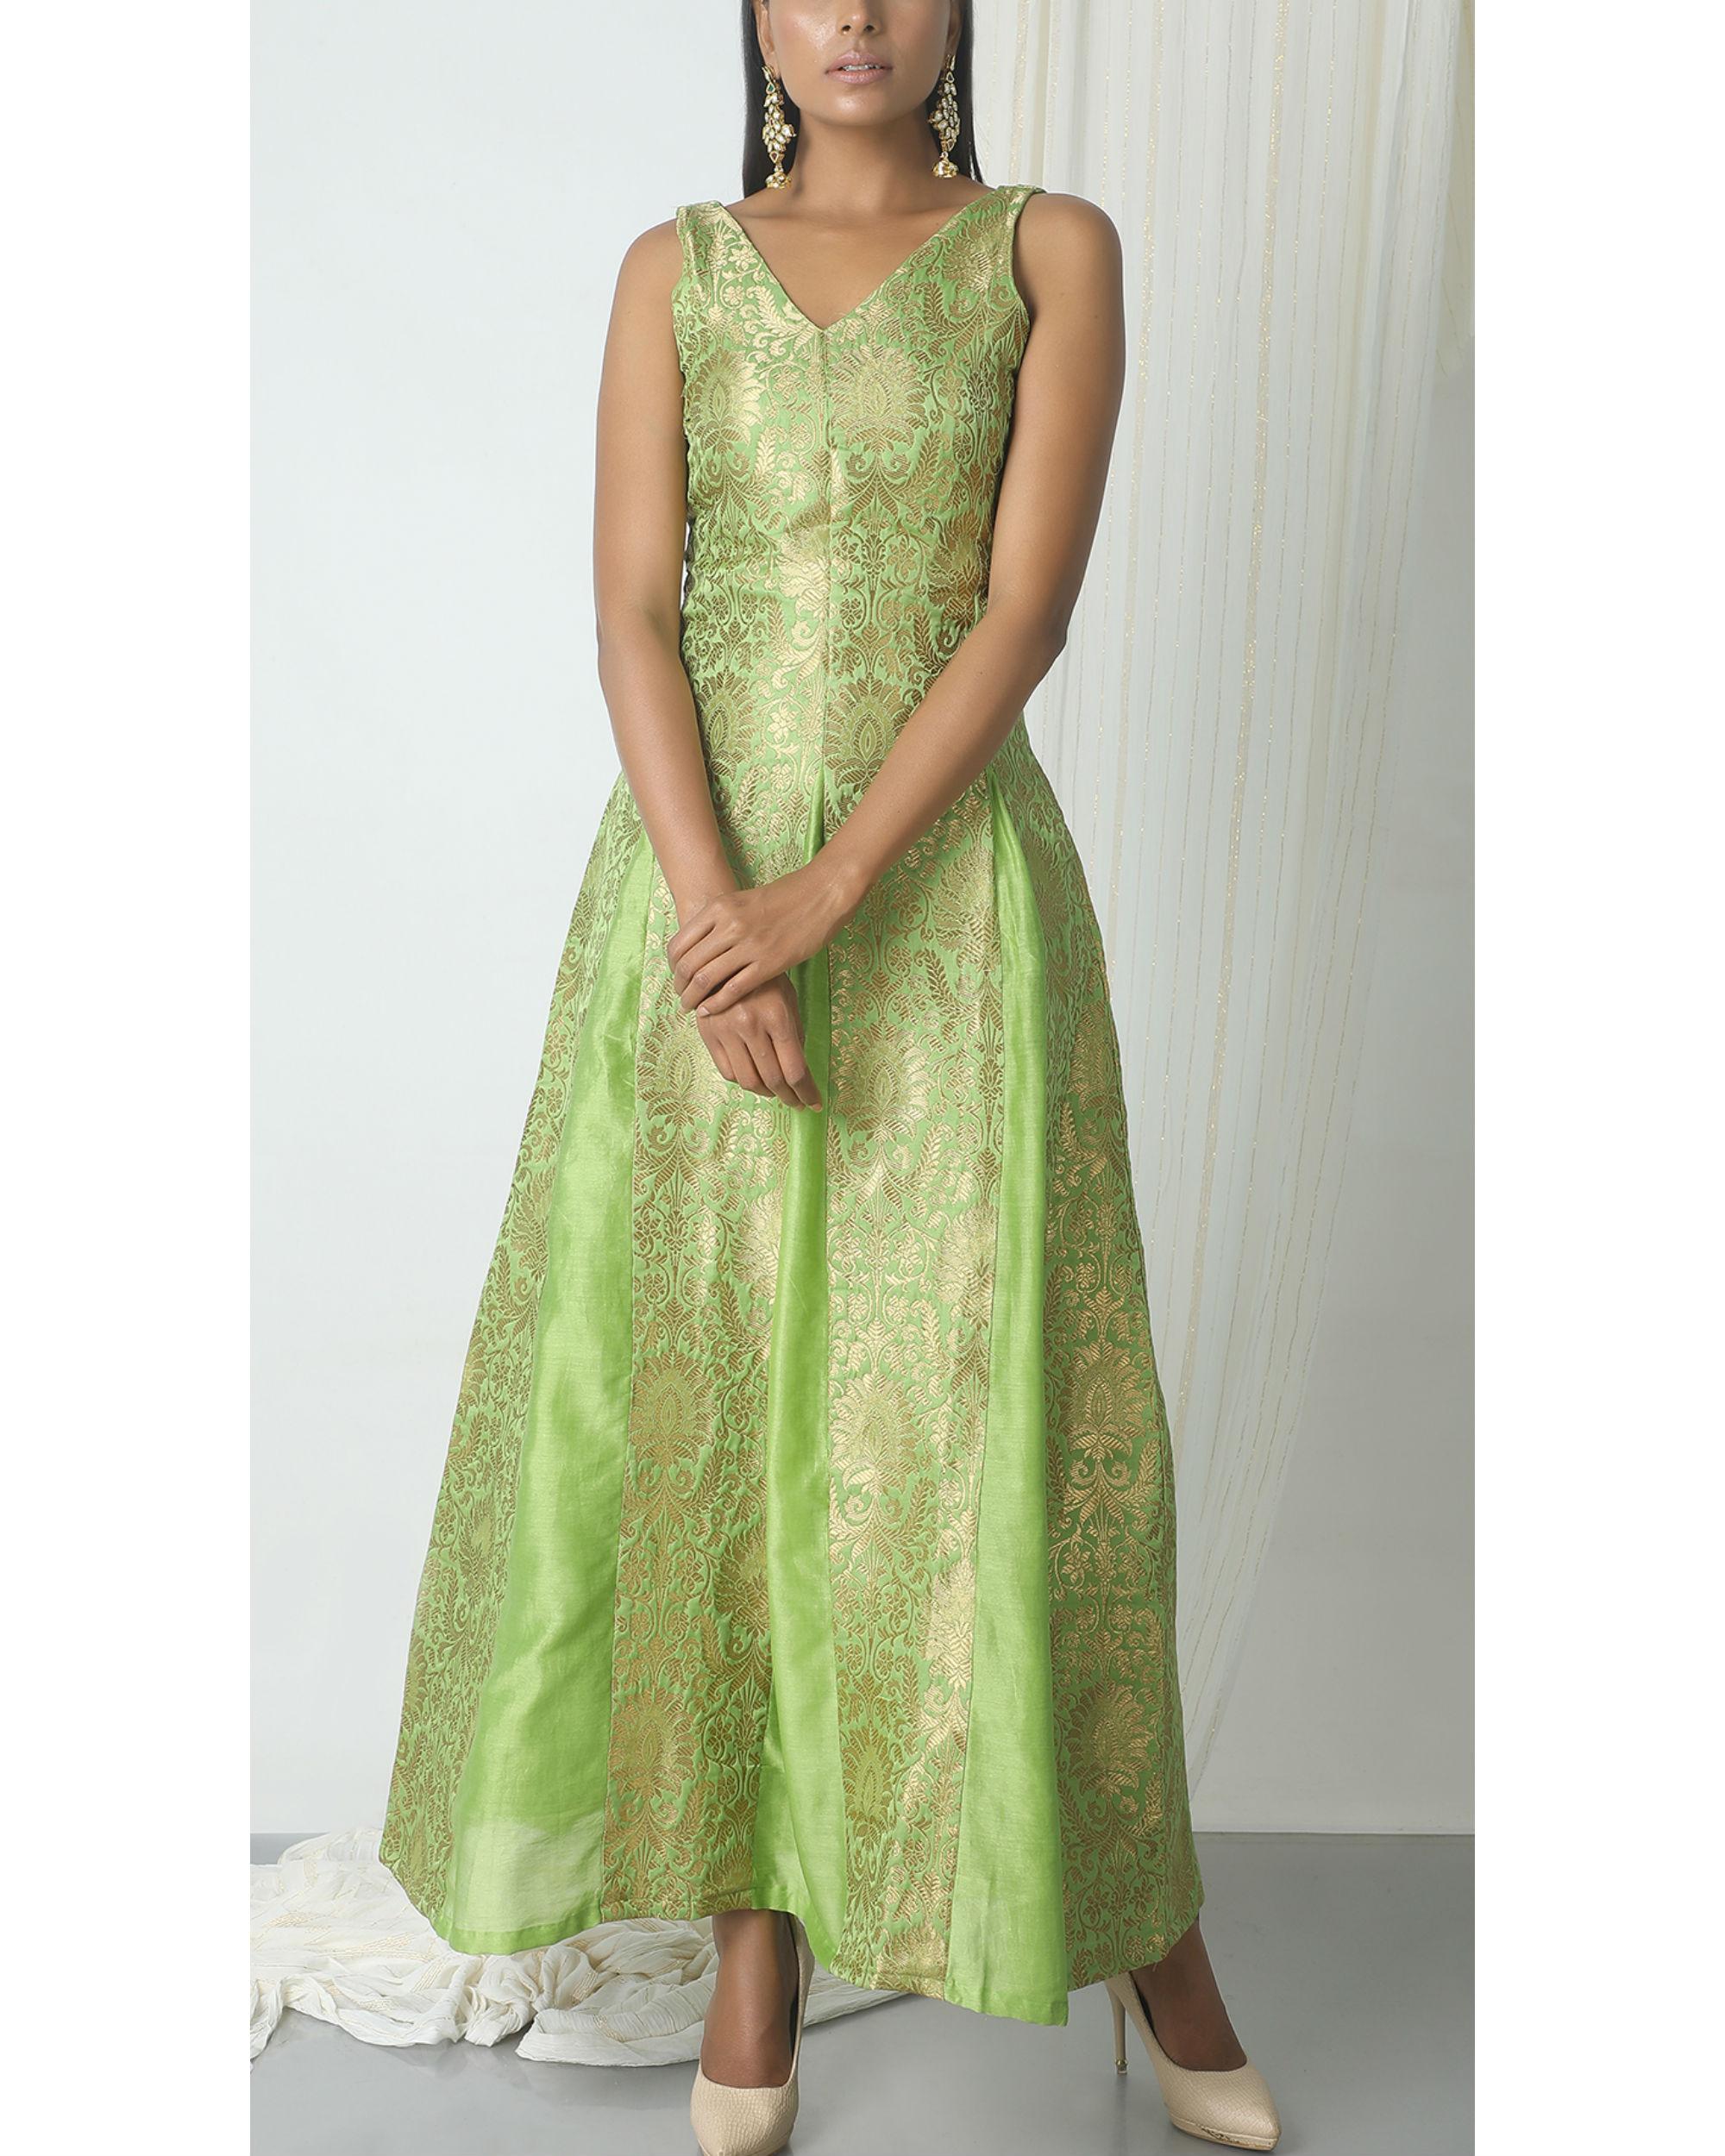 Chartreuse green brocade dress by trueBrowns | The Secret Label